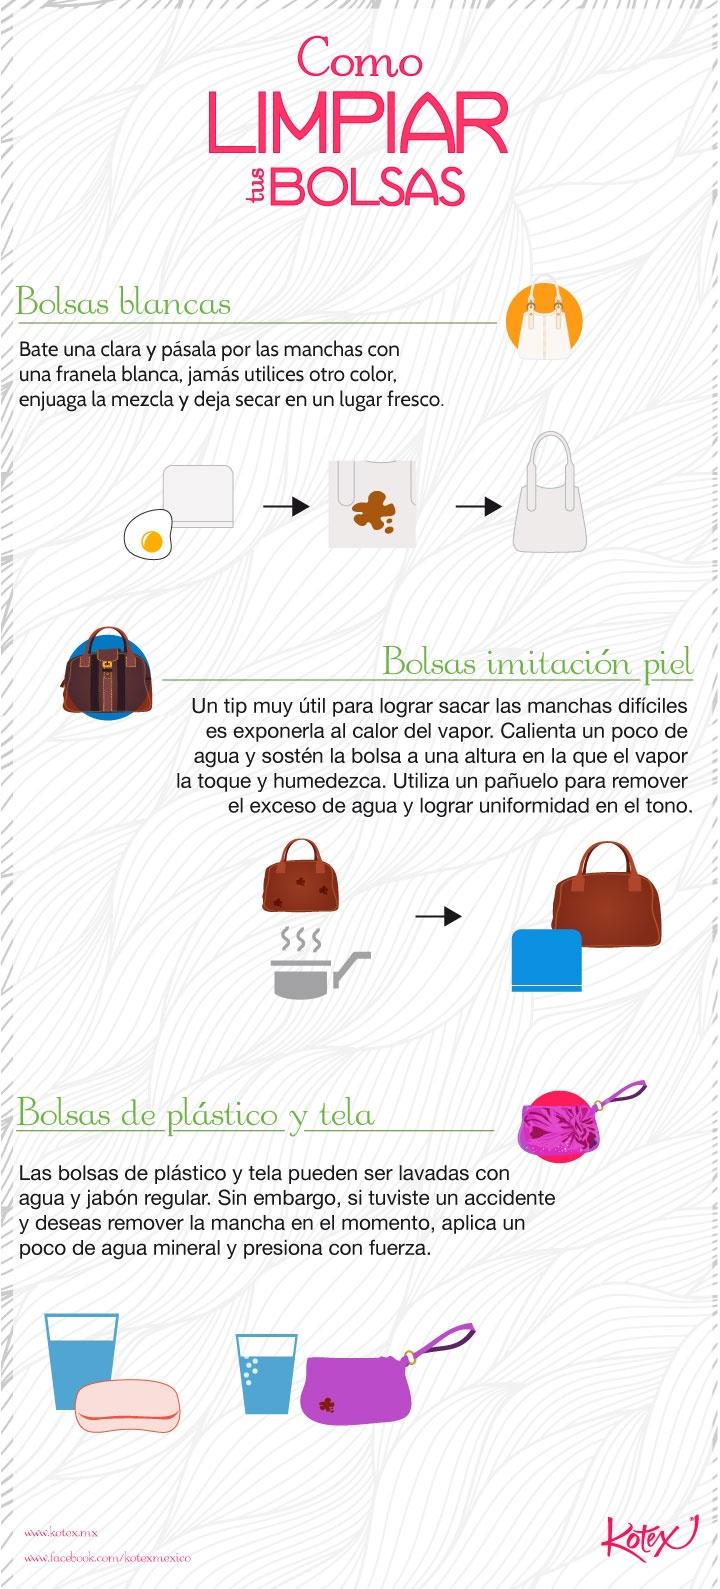 Cómo limpiar tus bolsas #mujeresenmovimiento #infografia #infographic #fashion #style #moda